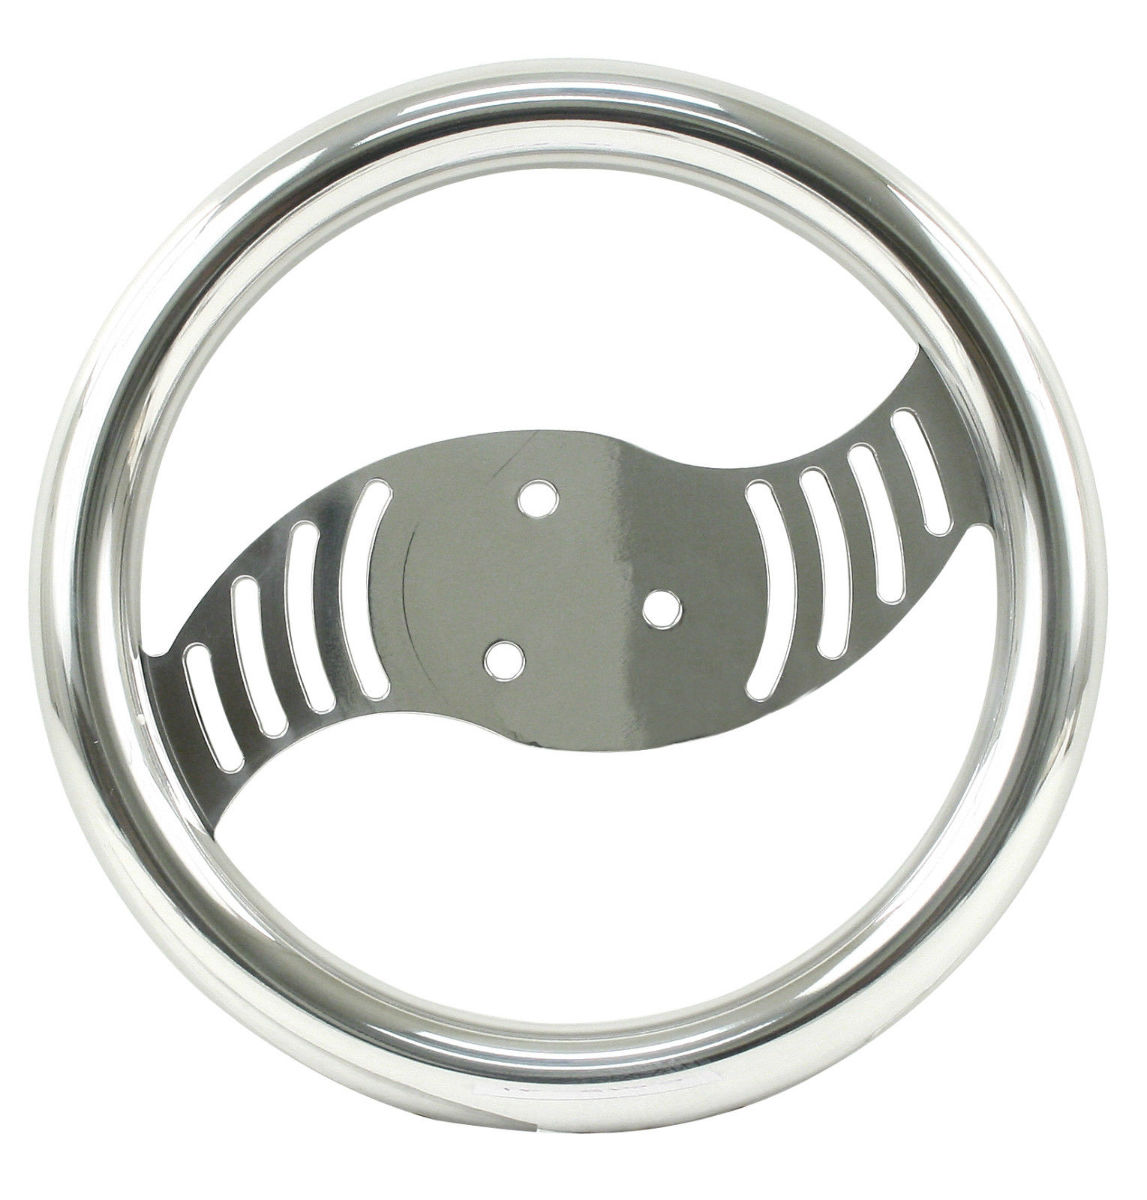 Sand Rail Horns : Vw bug sand rail rat rod quot polished aluminum vortex